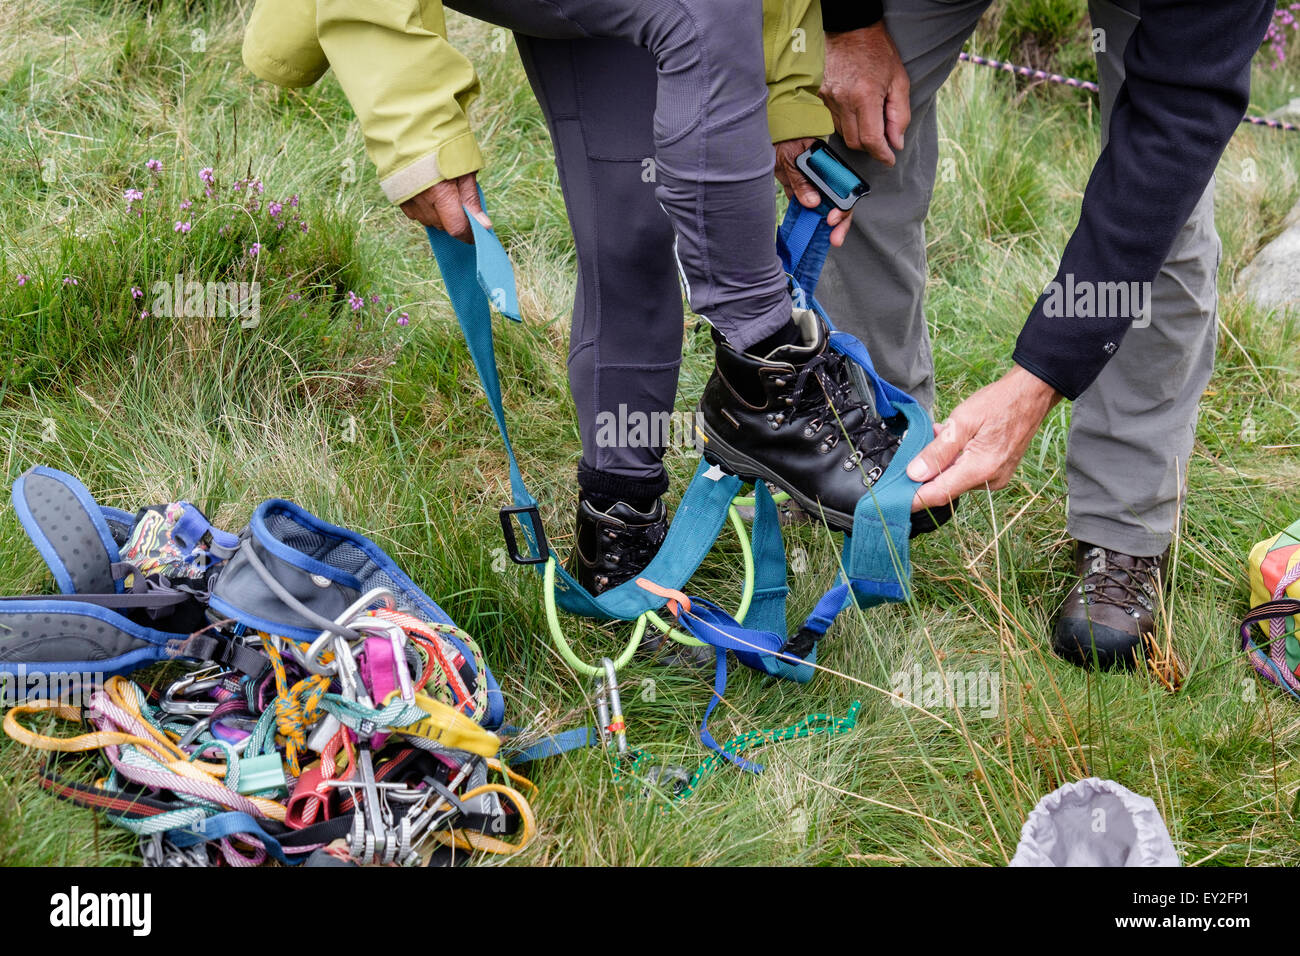 Rock climber teaching a novice to put on a climbing harness. UK, Britain - Stock Image